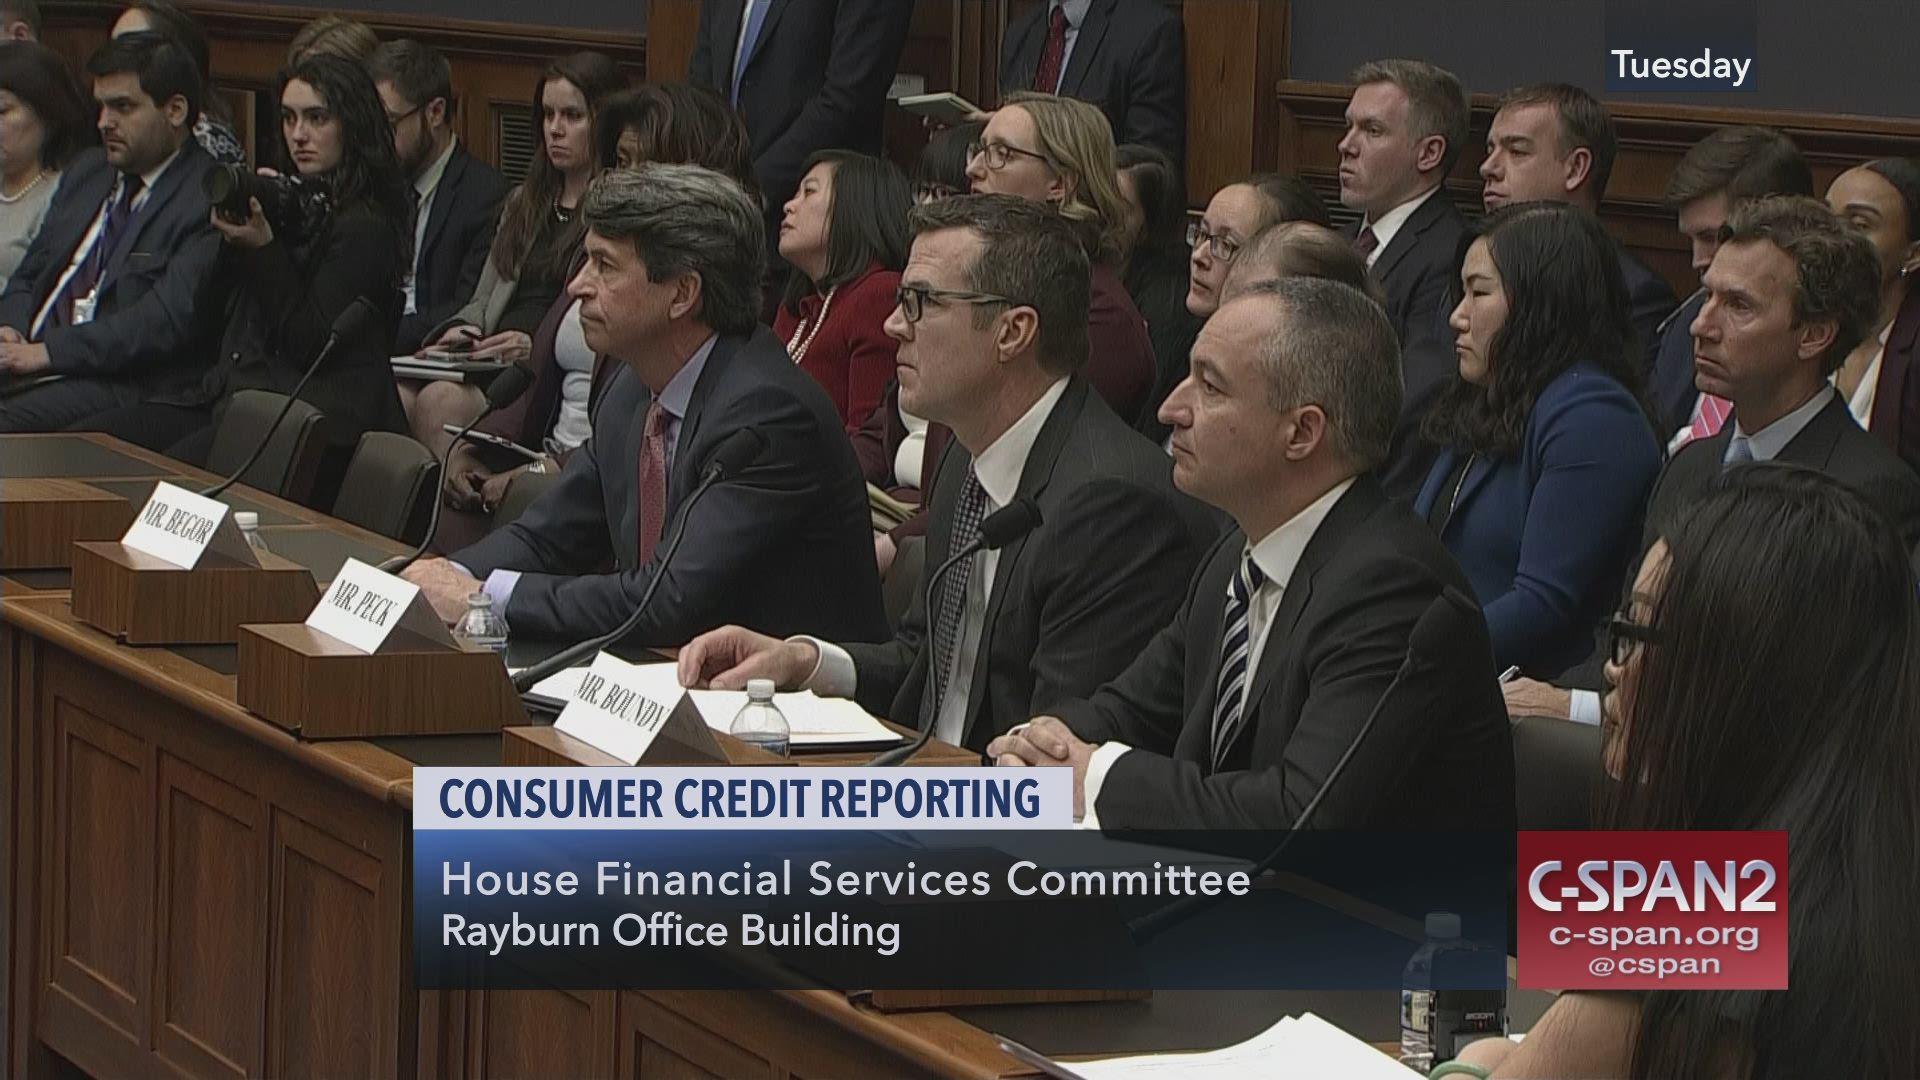 Consumer Credit Reporting, Part 1